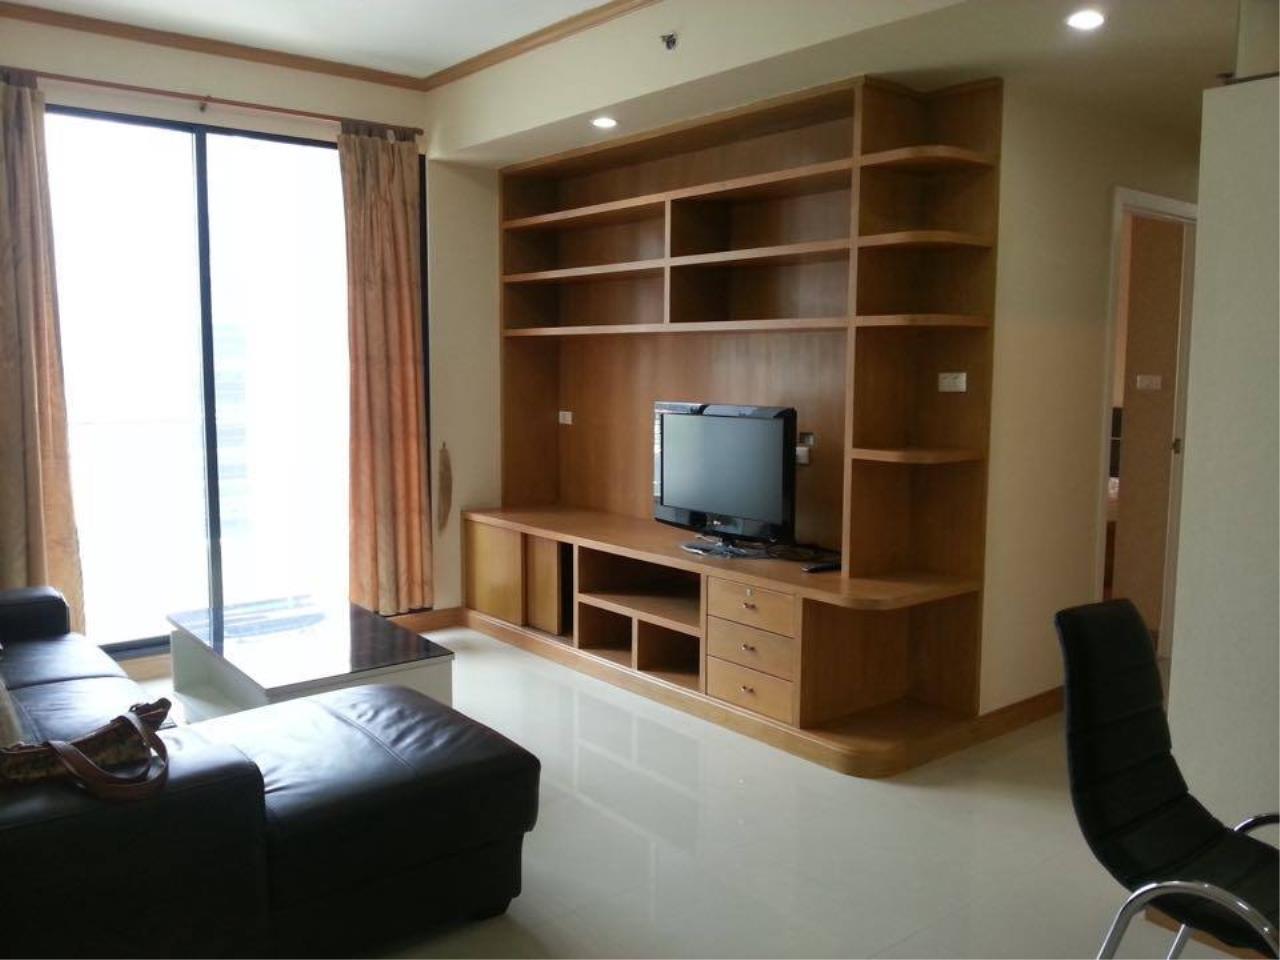 Agent - Mayteekul Sujirapinyokul Agency's AC3180418 For Rent Condo Supalai Premier Place Asoke Condo MRT Phetchaburi 4